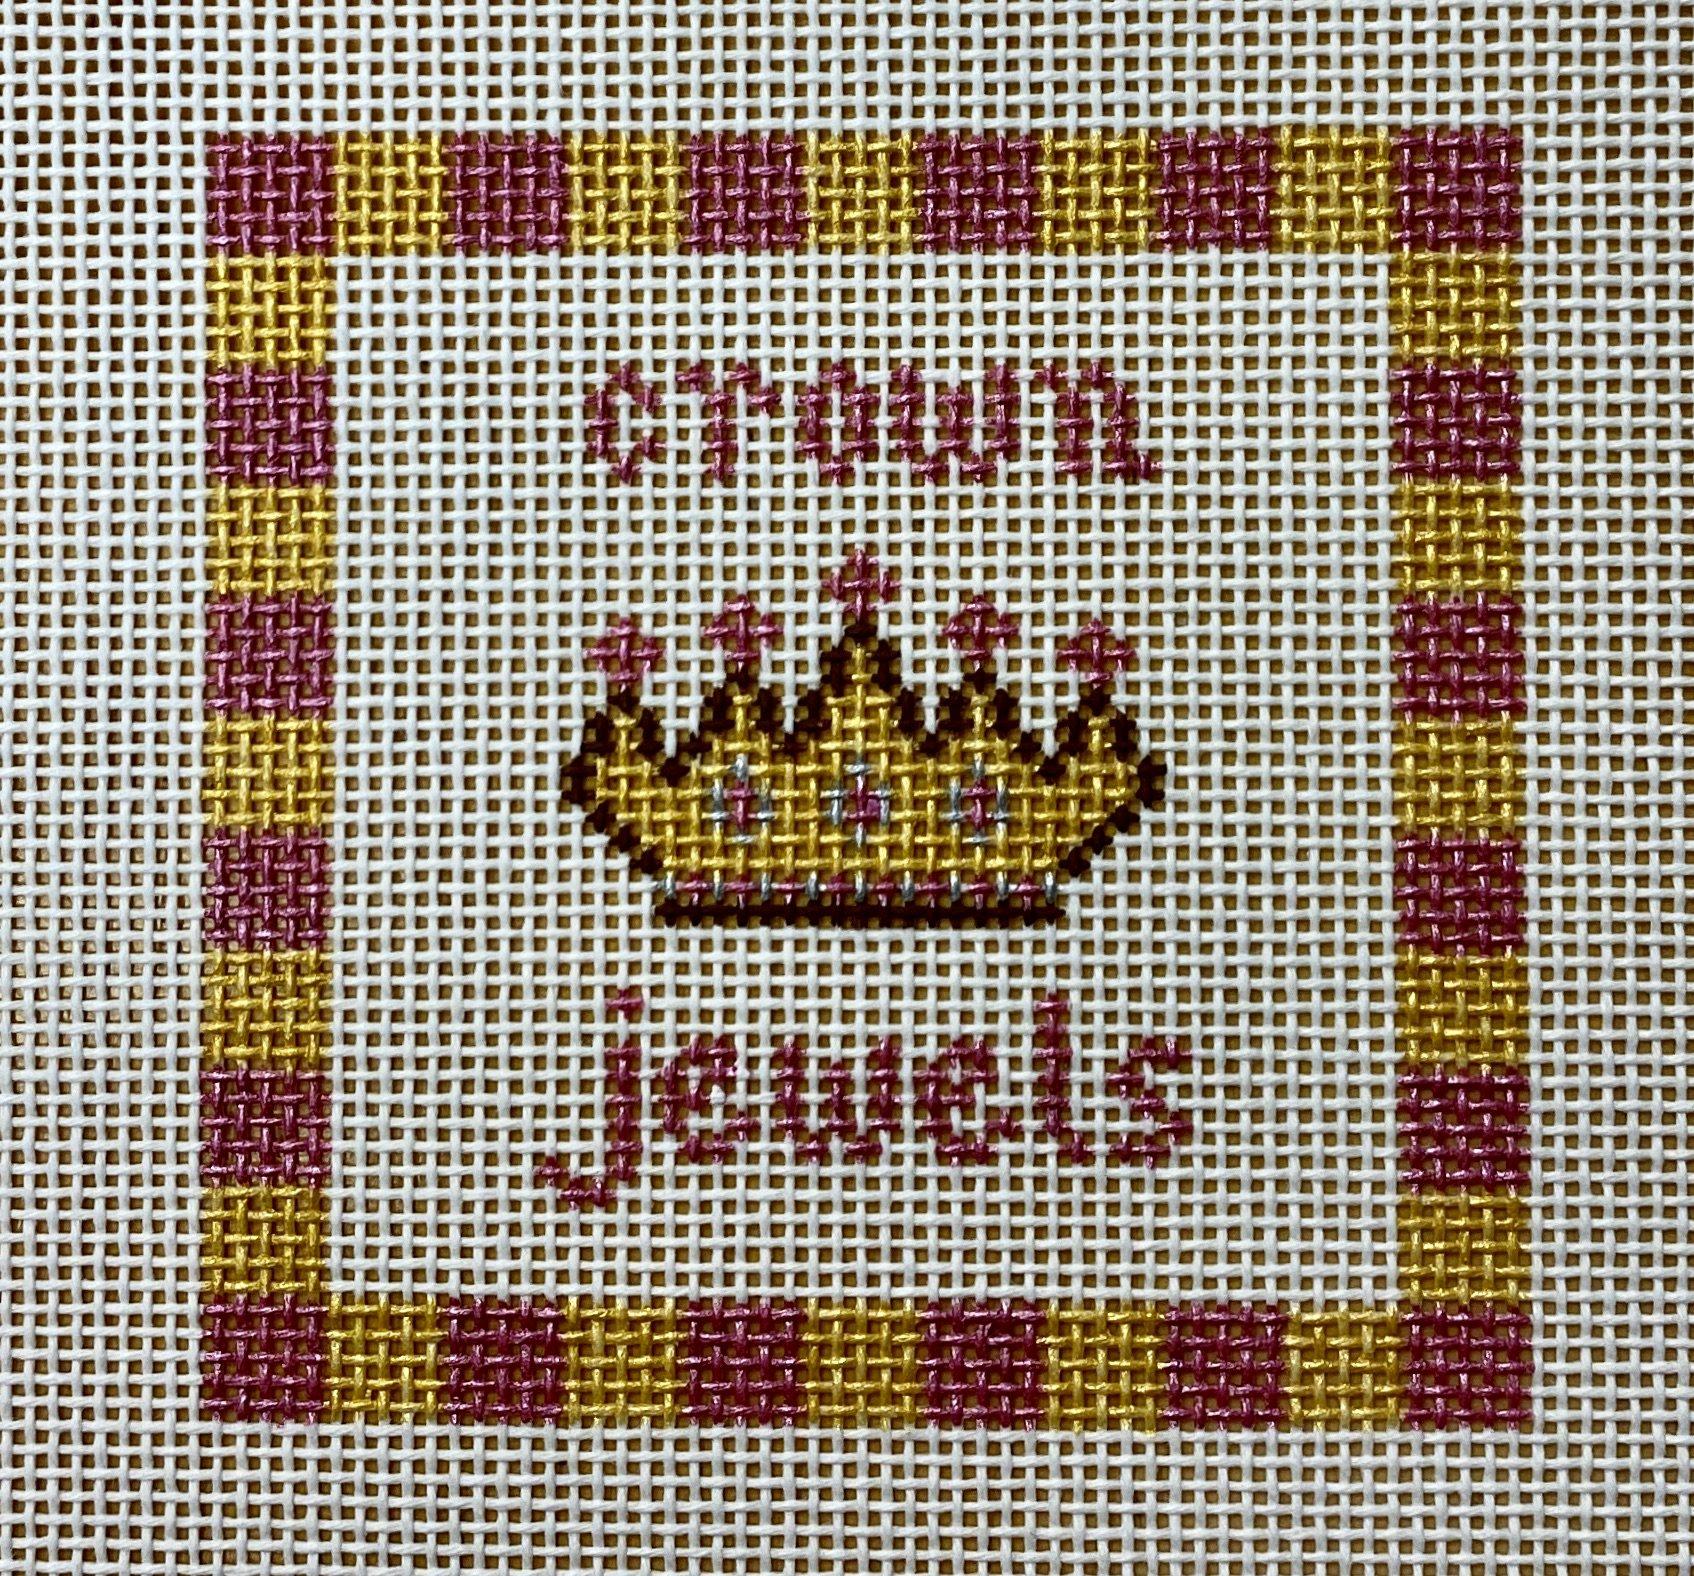 crown jewels, pink